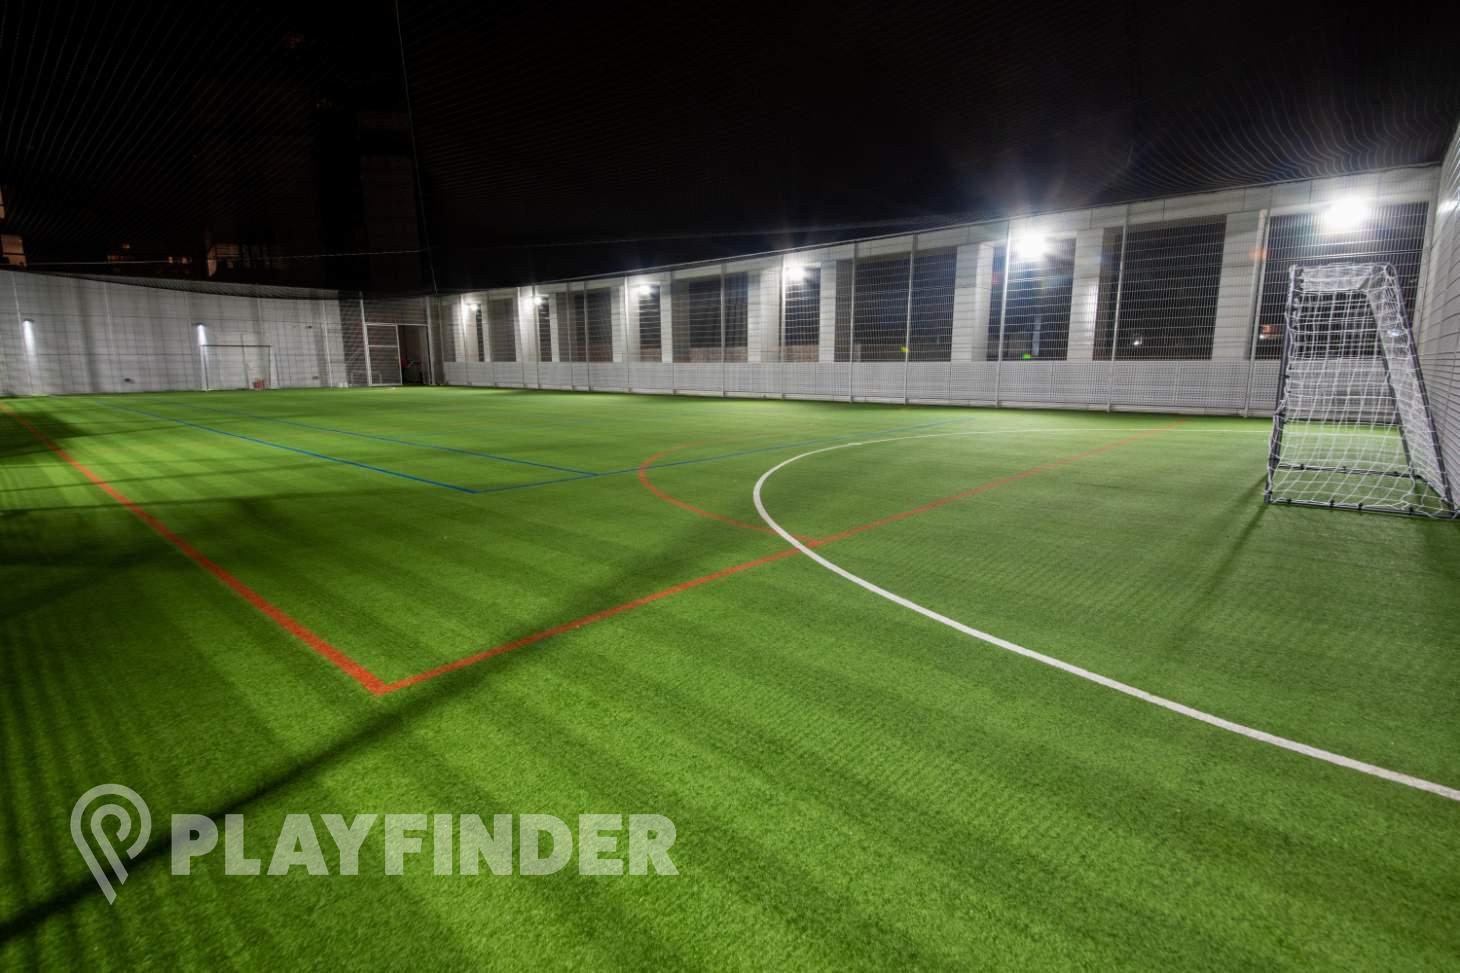 Battersea - Football567.com 5 a side | Astroturf football pitch